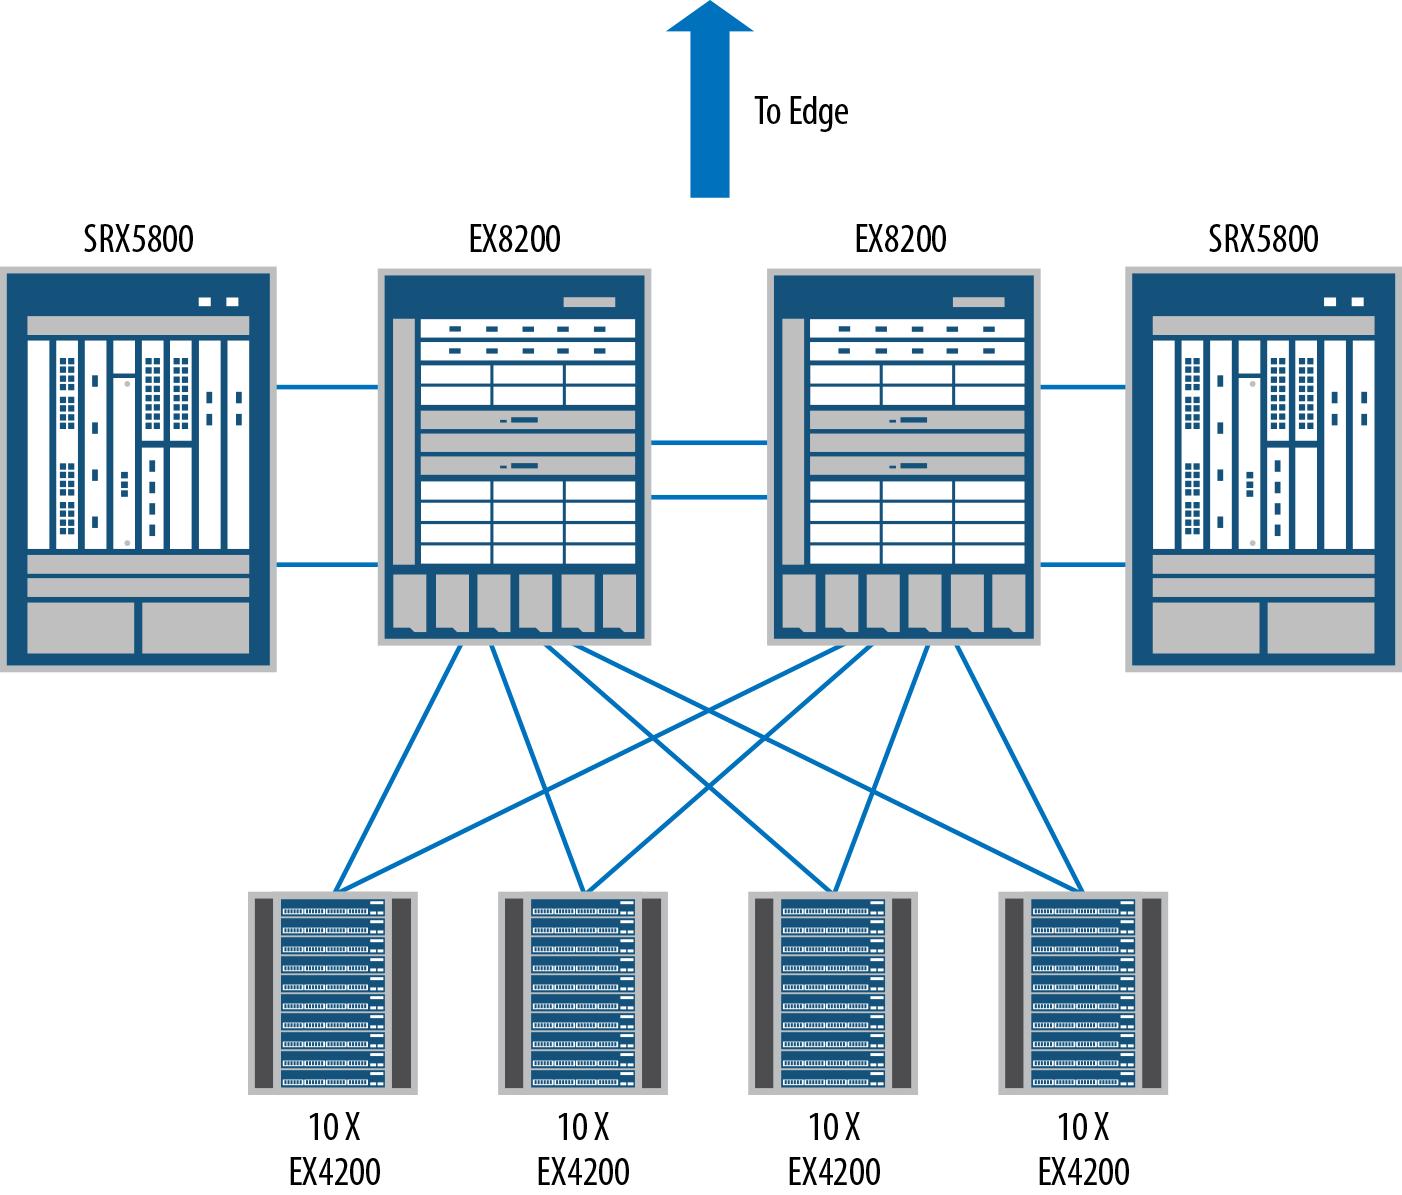 An SRX5800 in the data center core